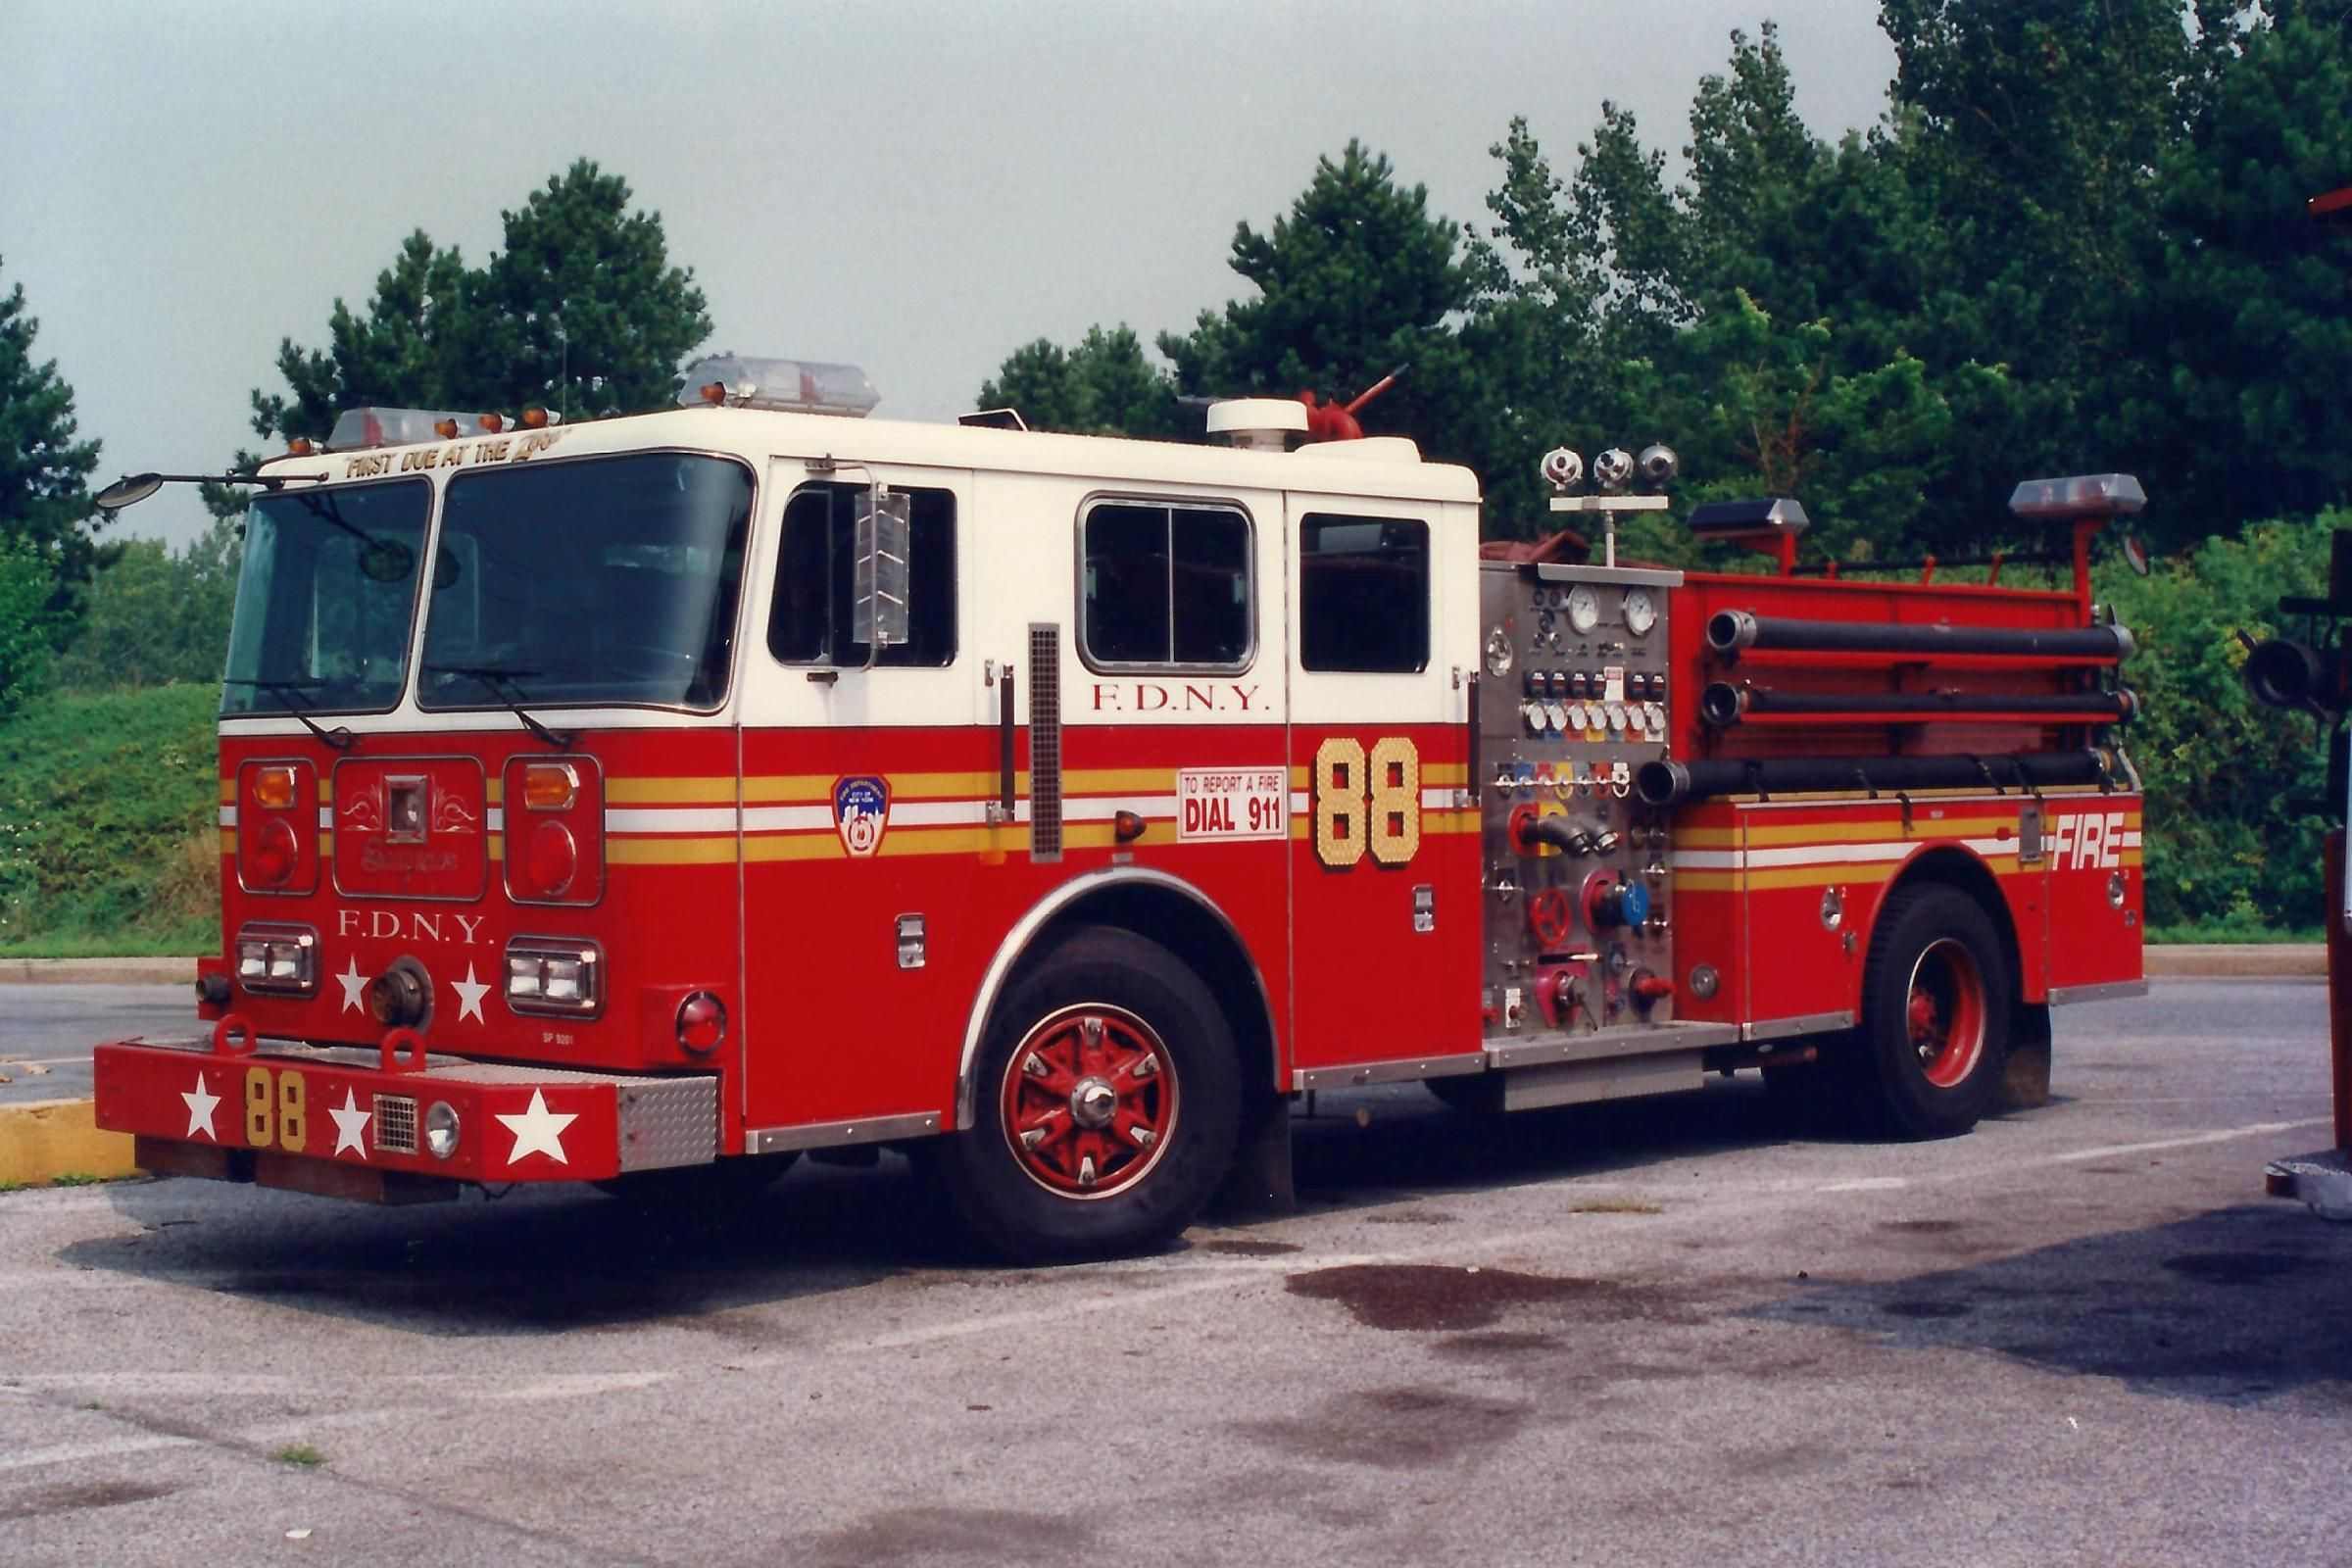 FDNY Engine 88 ~ 1997 Seagrave 1000/500 Pumper.